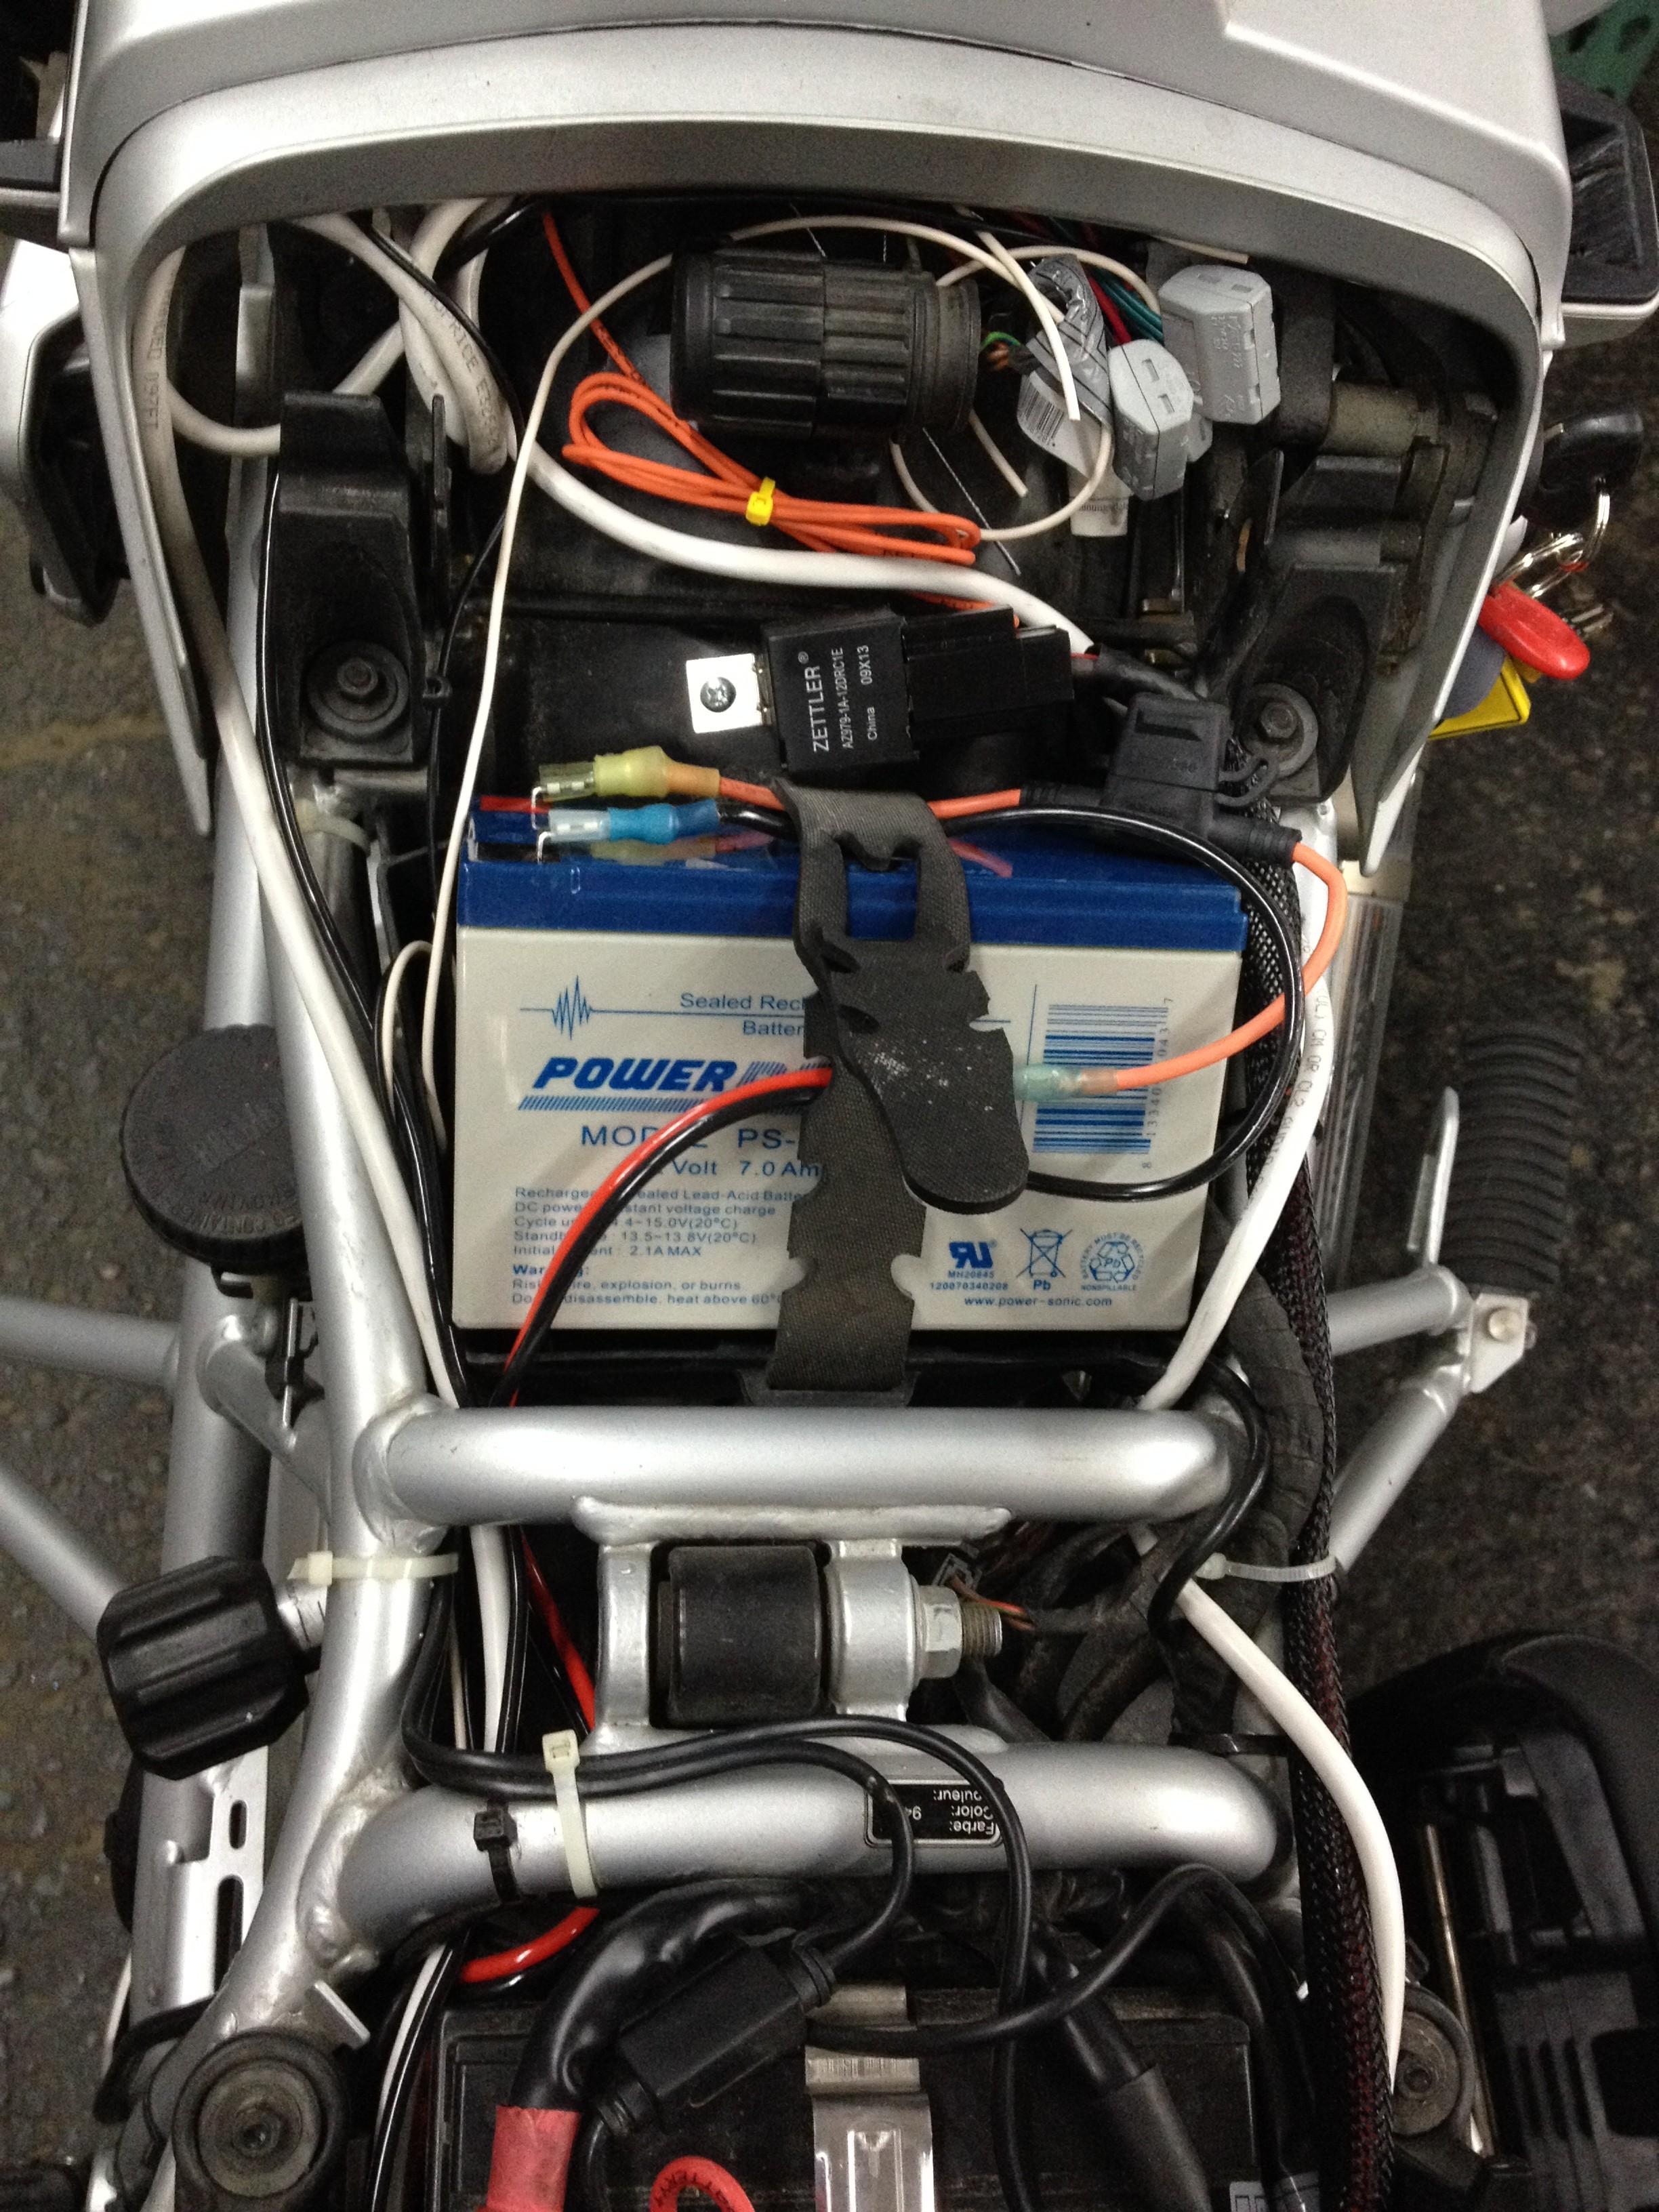 Fuse box location on r gs f wiring